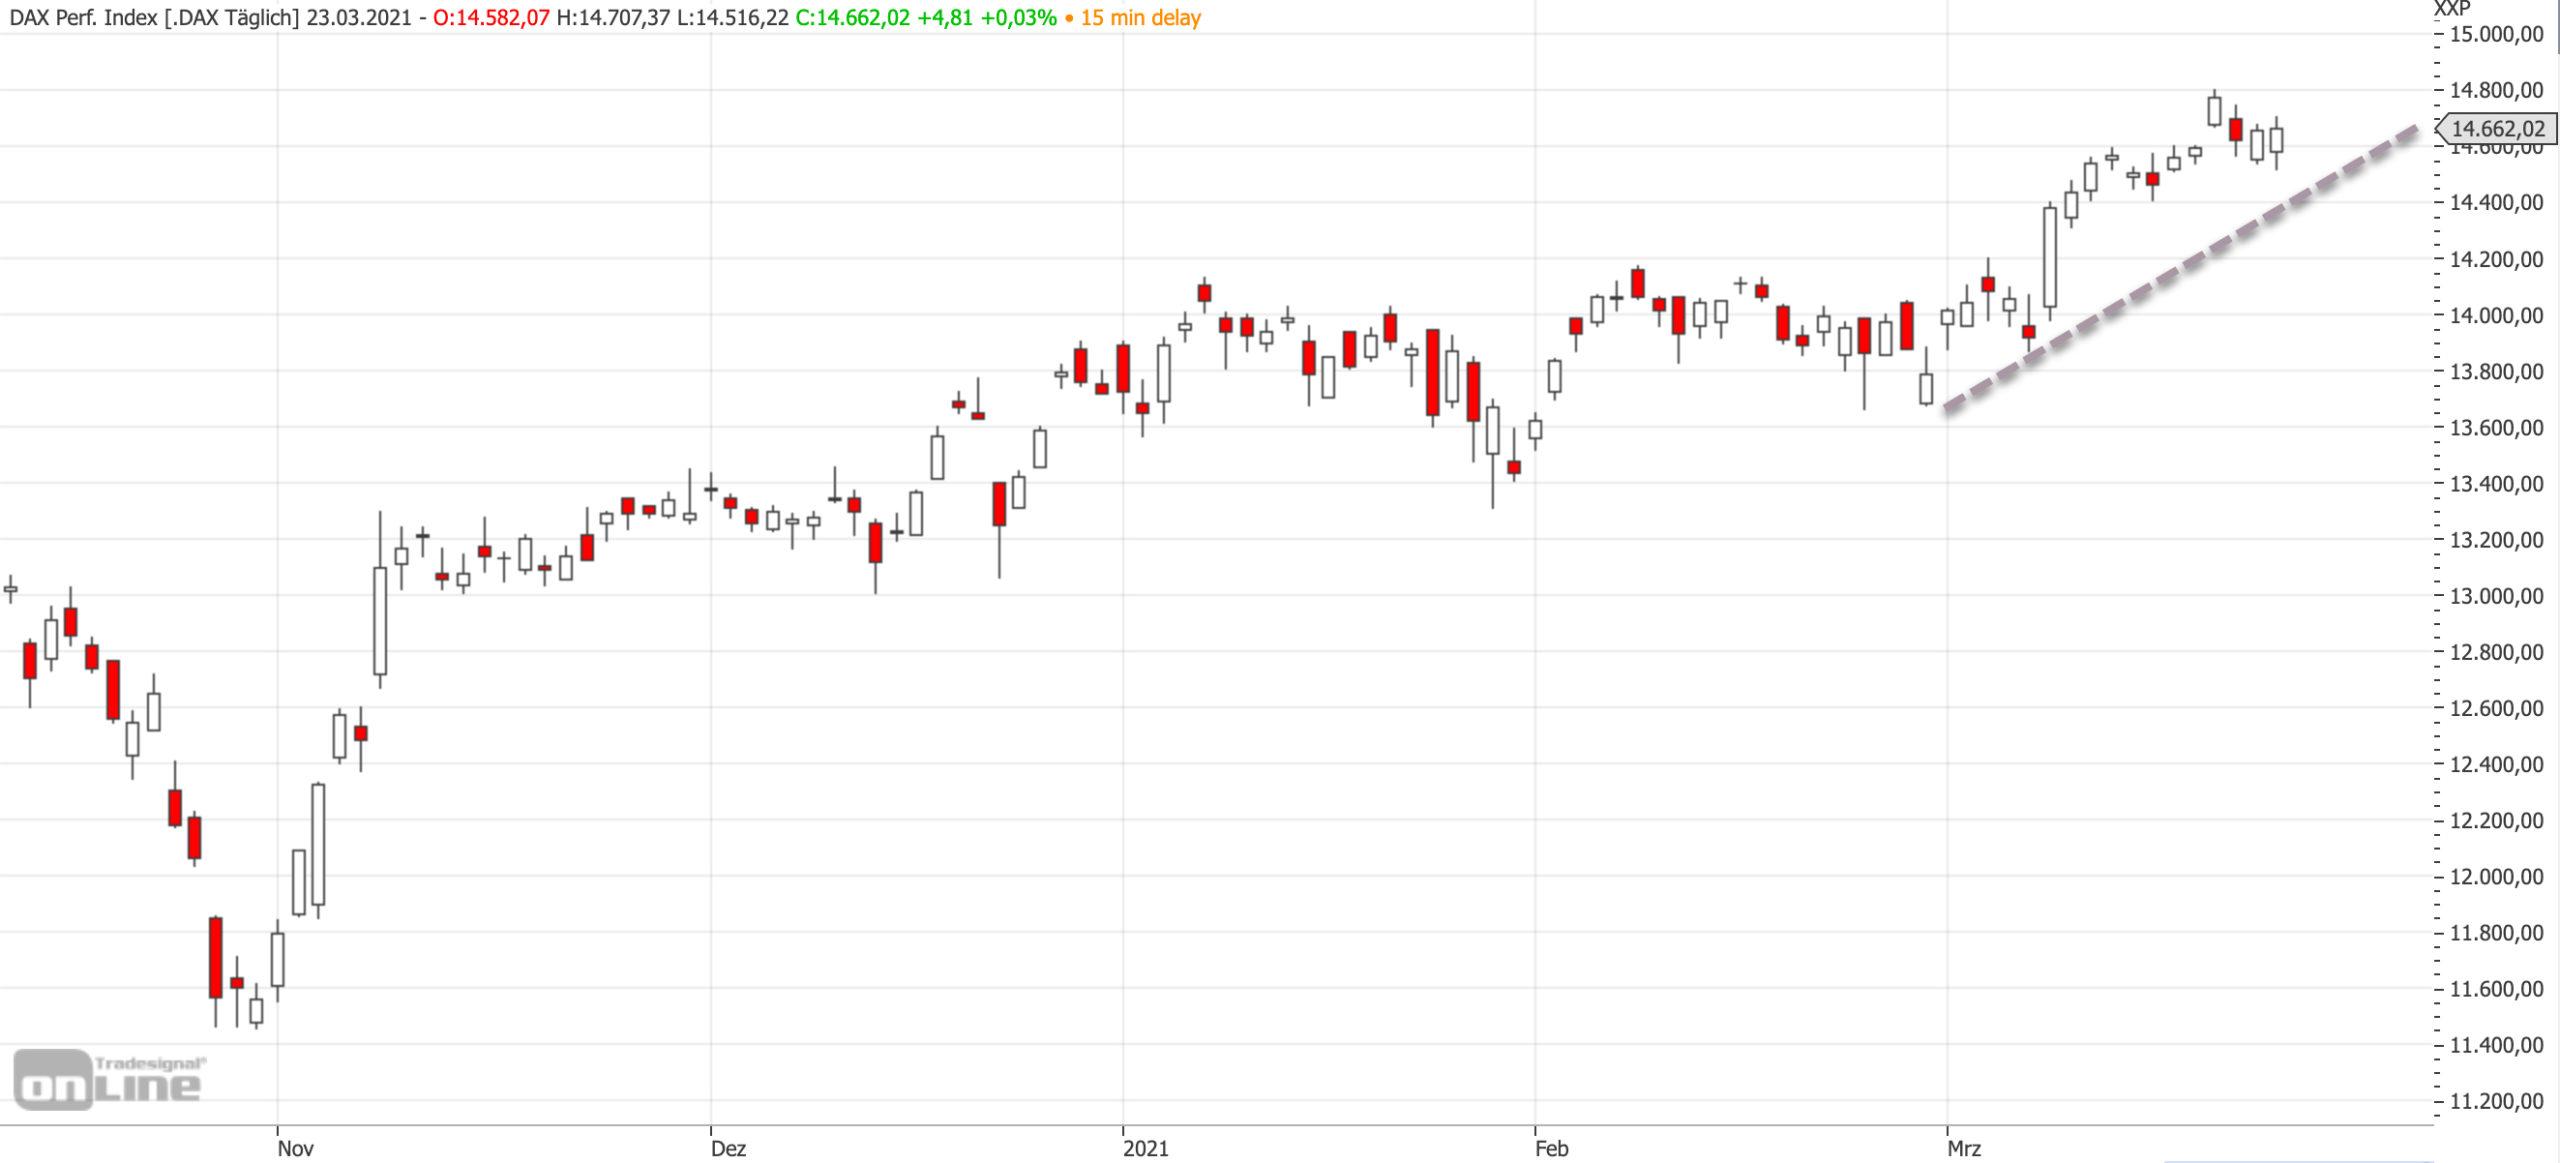 Mittelfristiger DAX-Chart am 23.03.2021